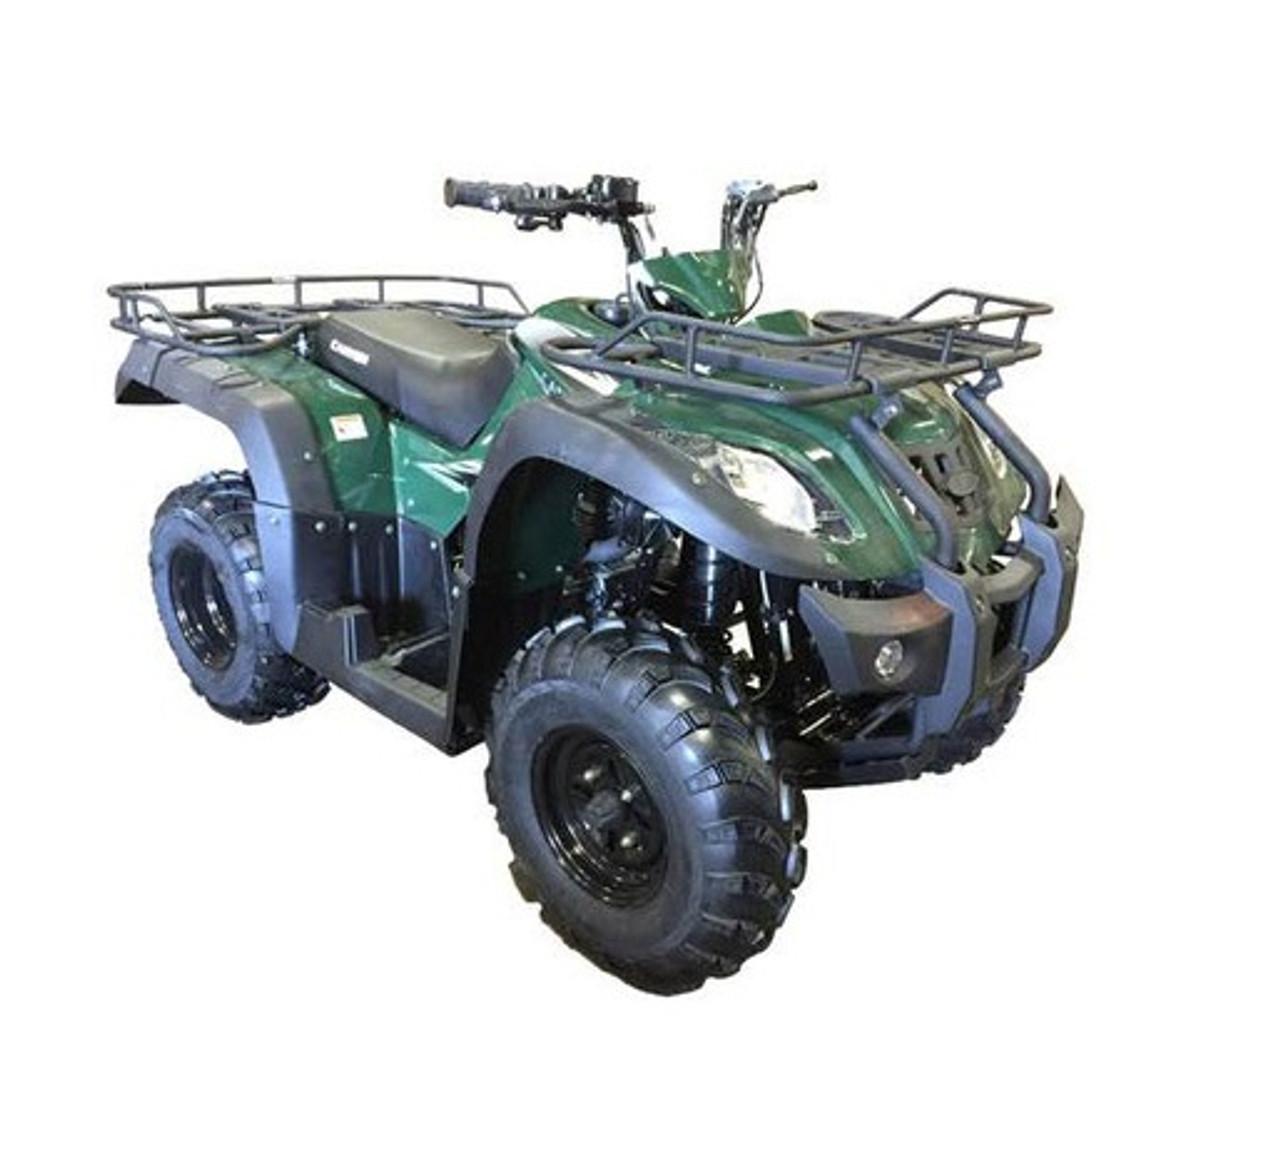 Vitacci CANYON 250cc ATV, Four-Stroke Engine W/Electric Start